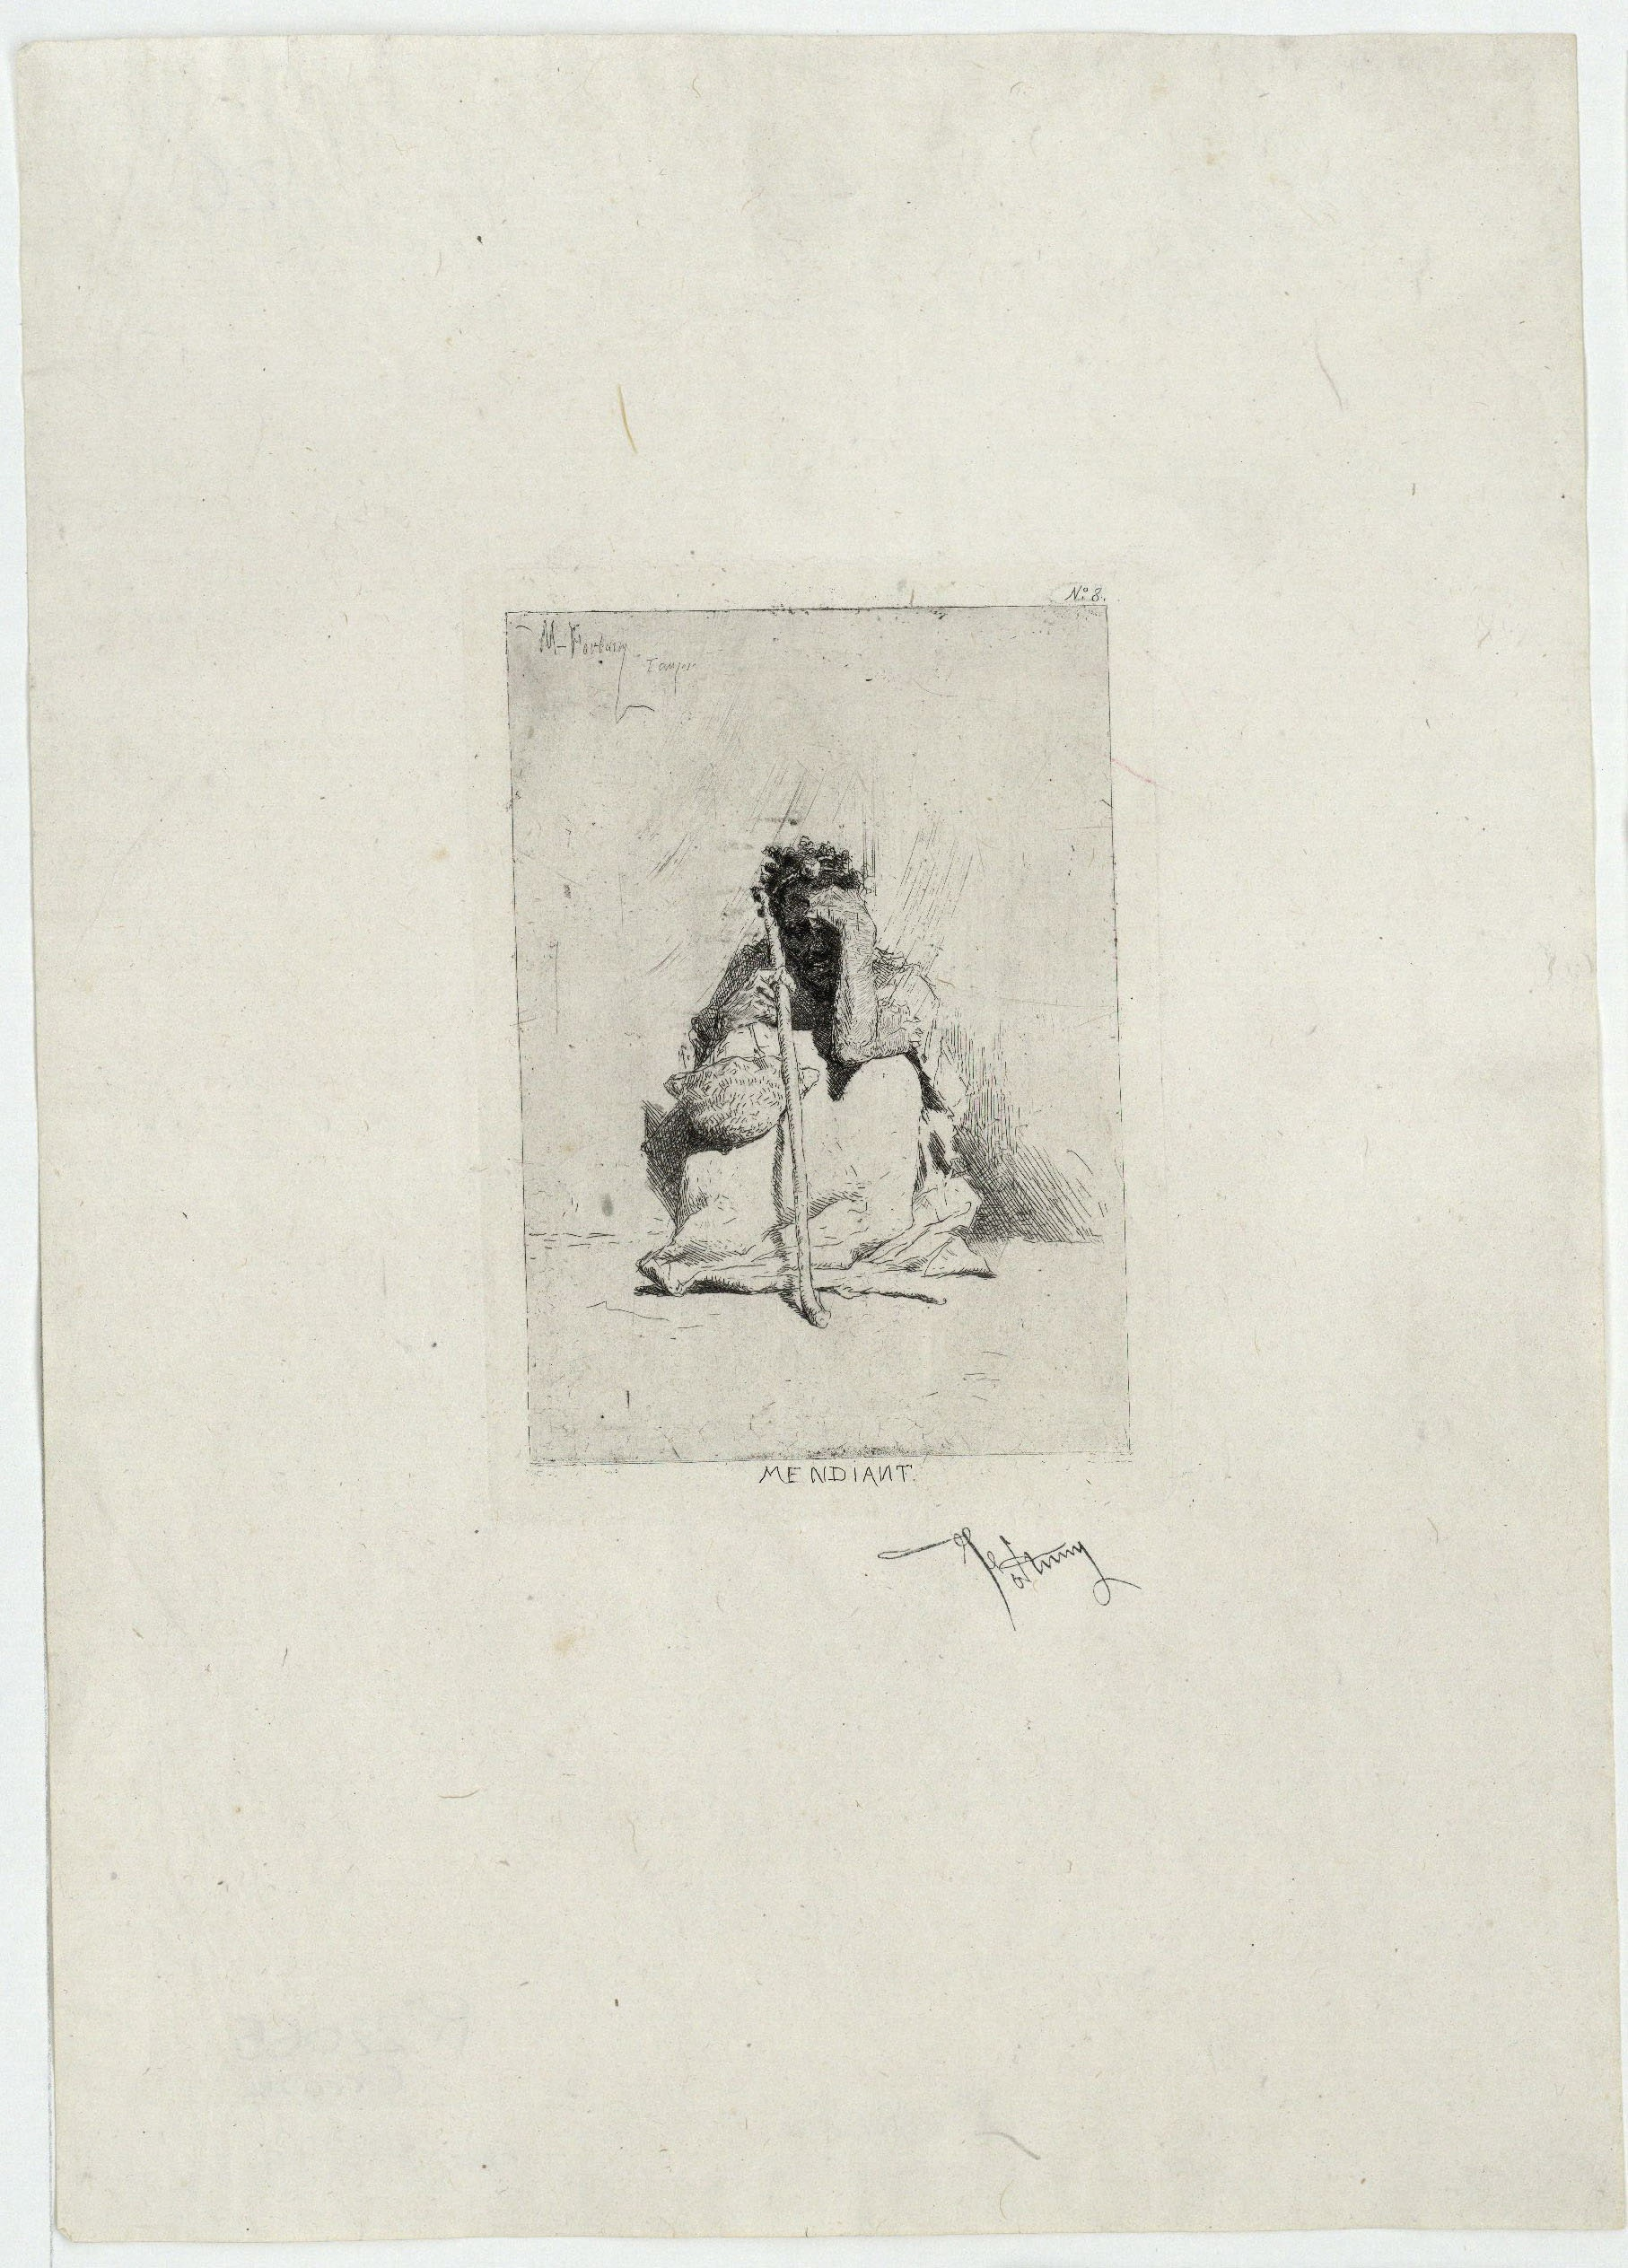 Marià Fortuny - Mendiant (Captaire) - Posterior a 1862